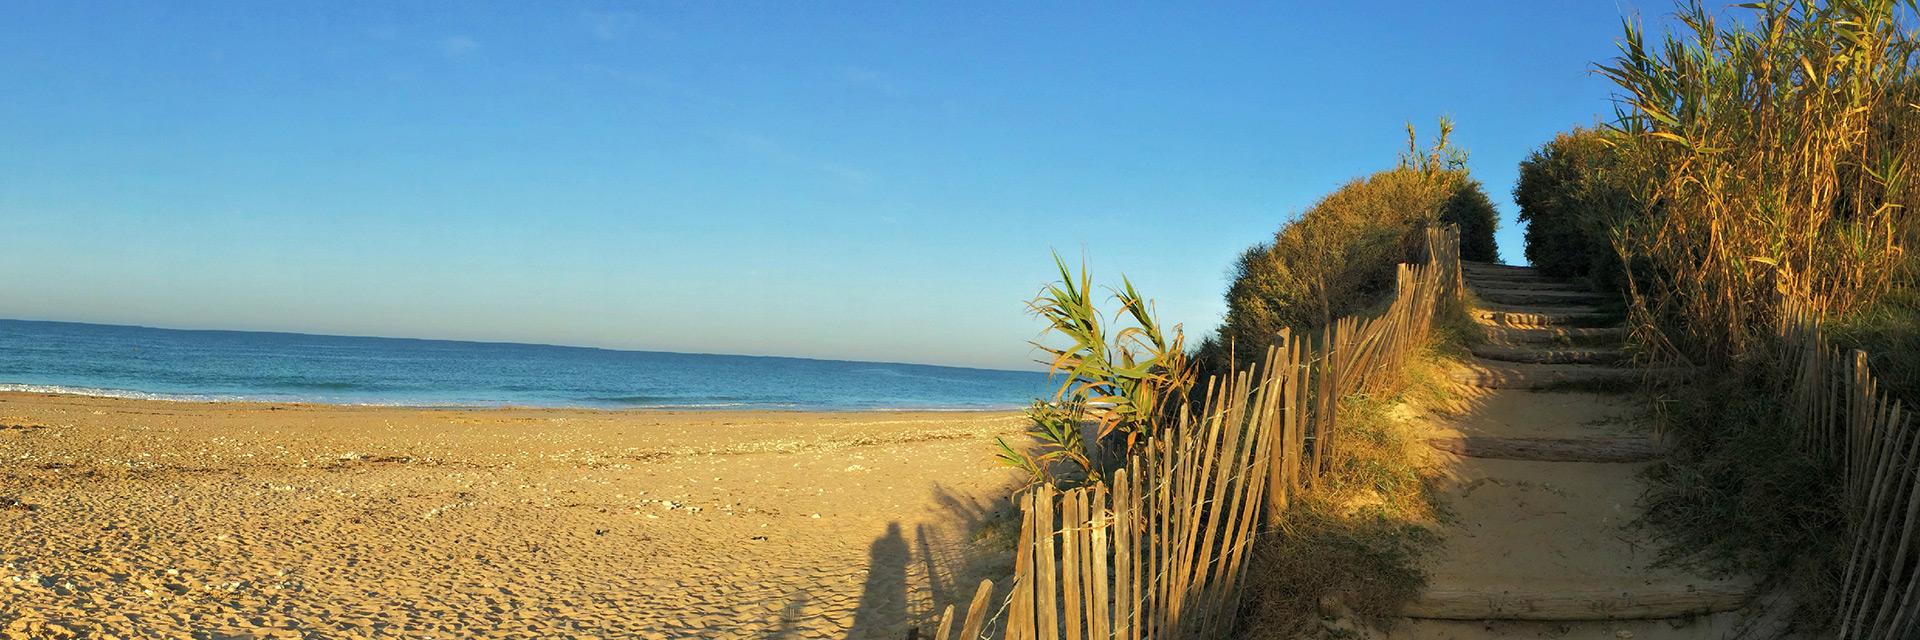 arc-en-ciel-oleron-CapFrance-dunes2